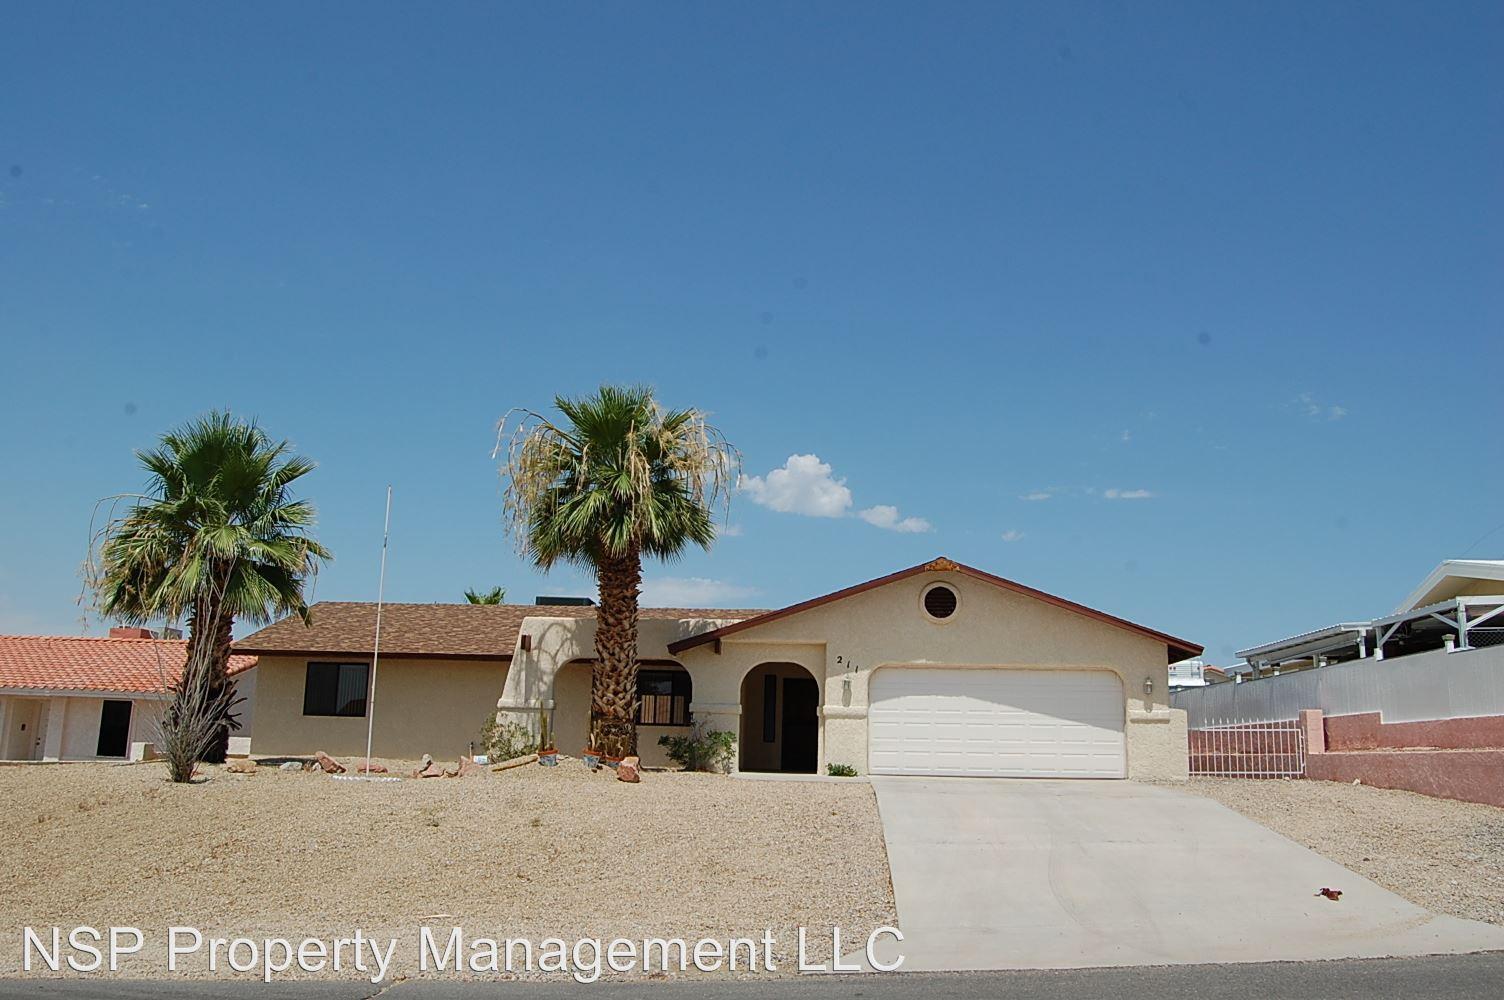 211 White Oak Dr, Lake Havasu City, AZ 86403 For Rent | Trulia